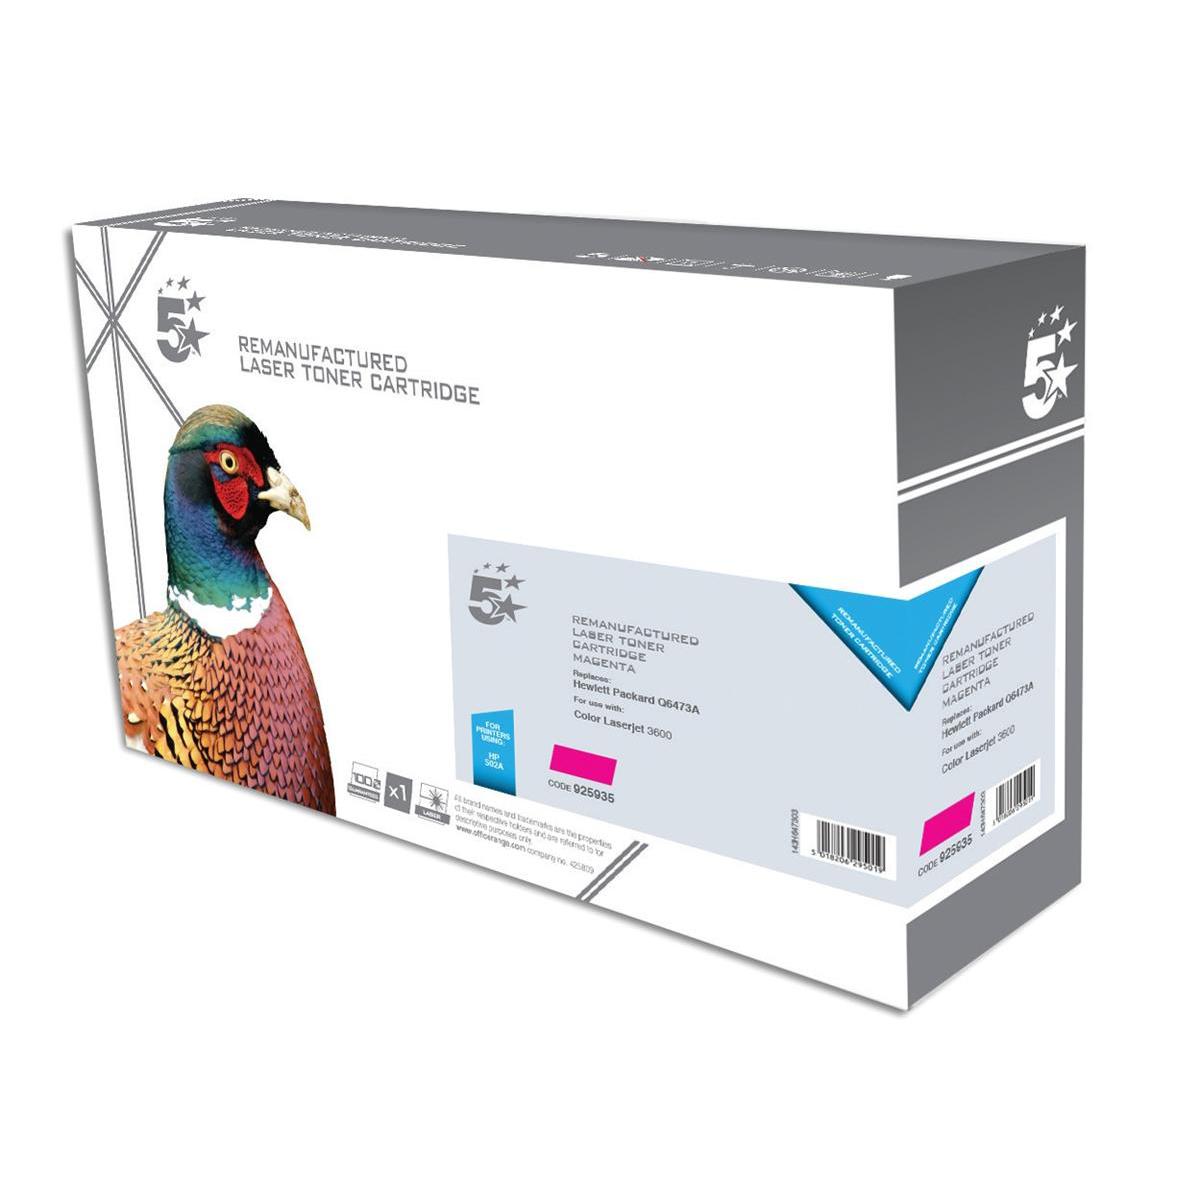 5 Star Office Remanufactured Laser Toner Cartridge 4000pp Magenta [HP 502A Q6473A Alternative]